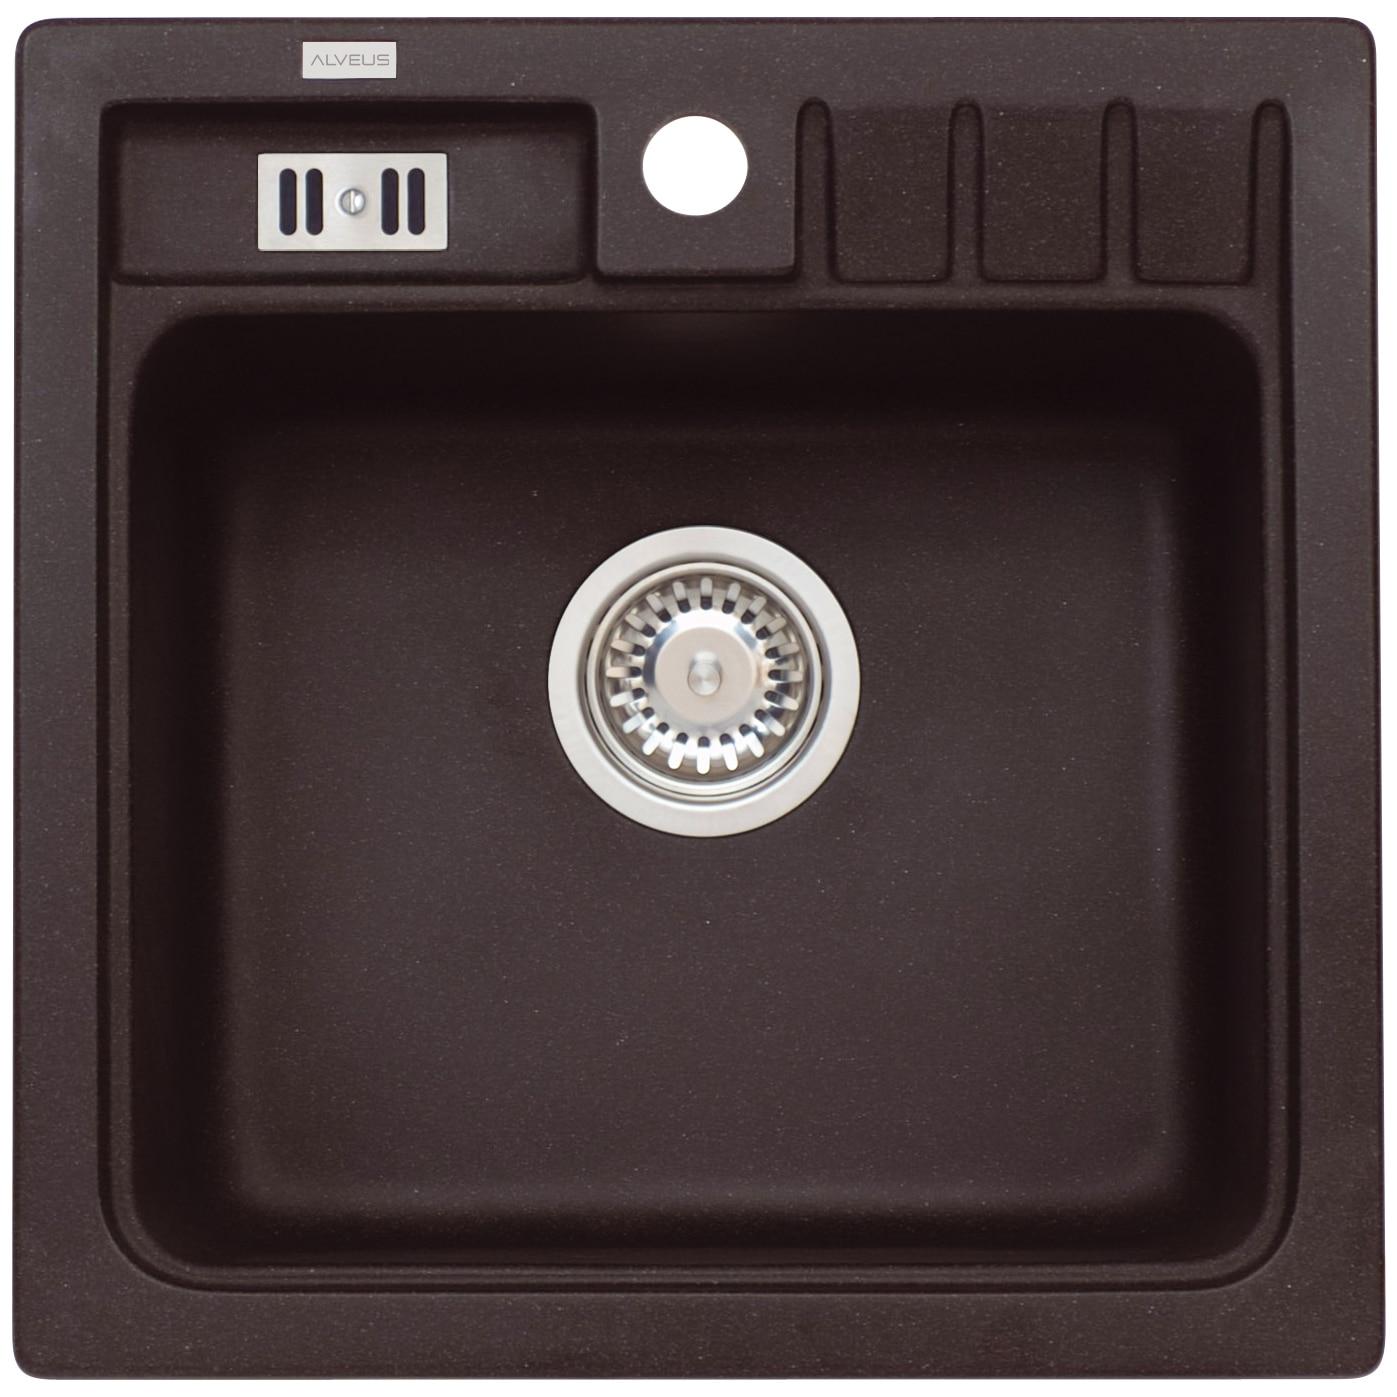 Fotografie Chiuveta Algranit Alveus Niagara 20 A91, 465x465mm, adancime cuva 180mm, material compozit, Negru